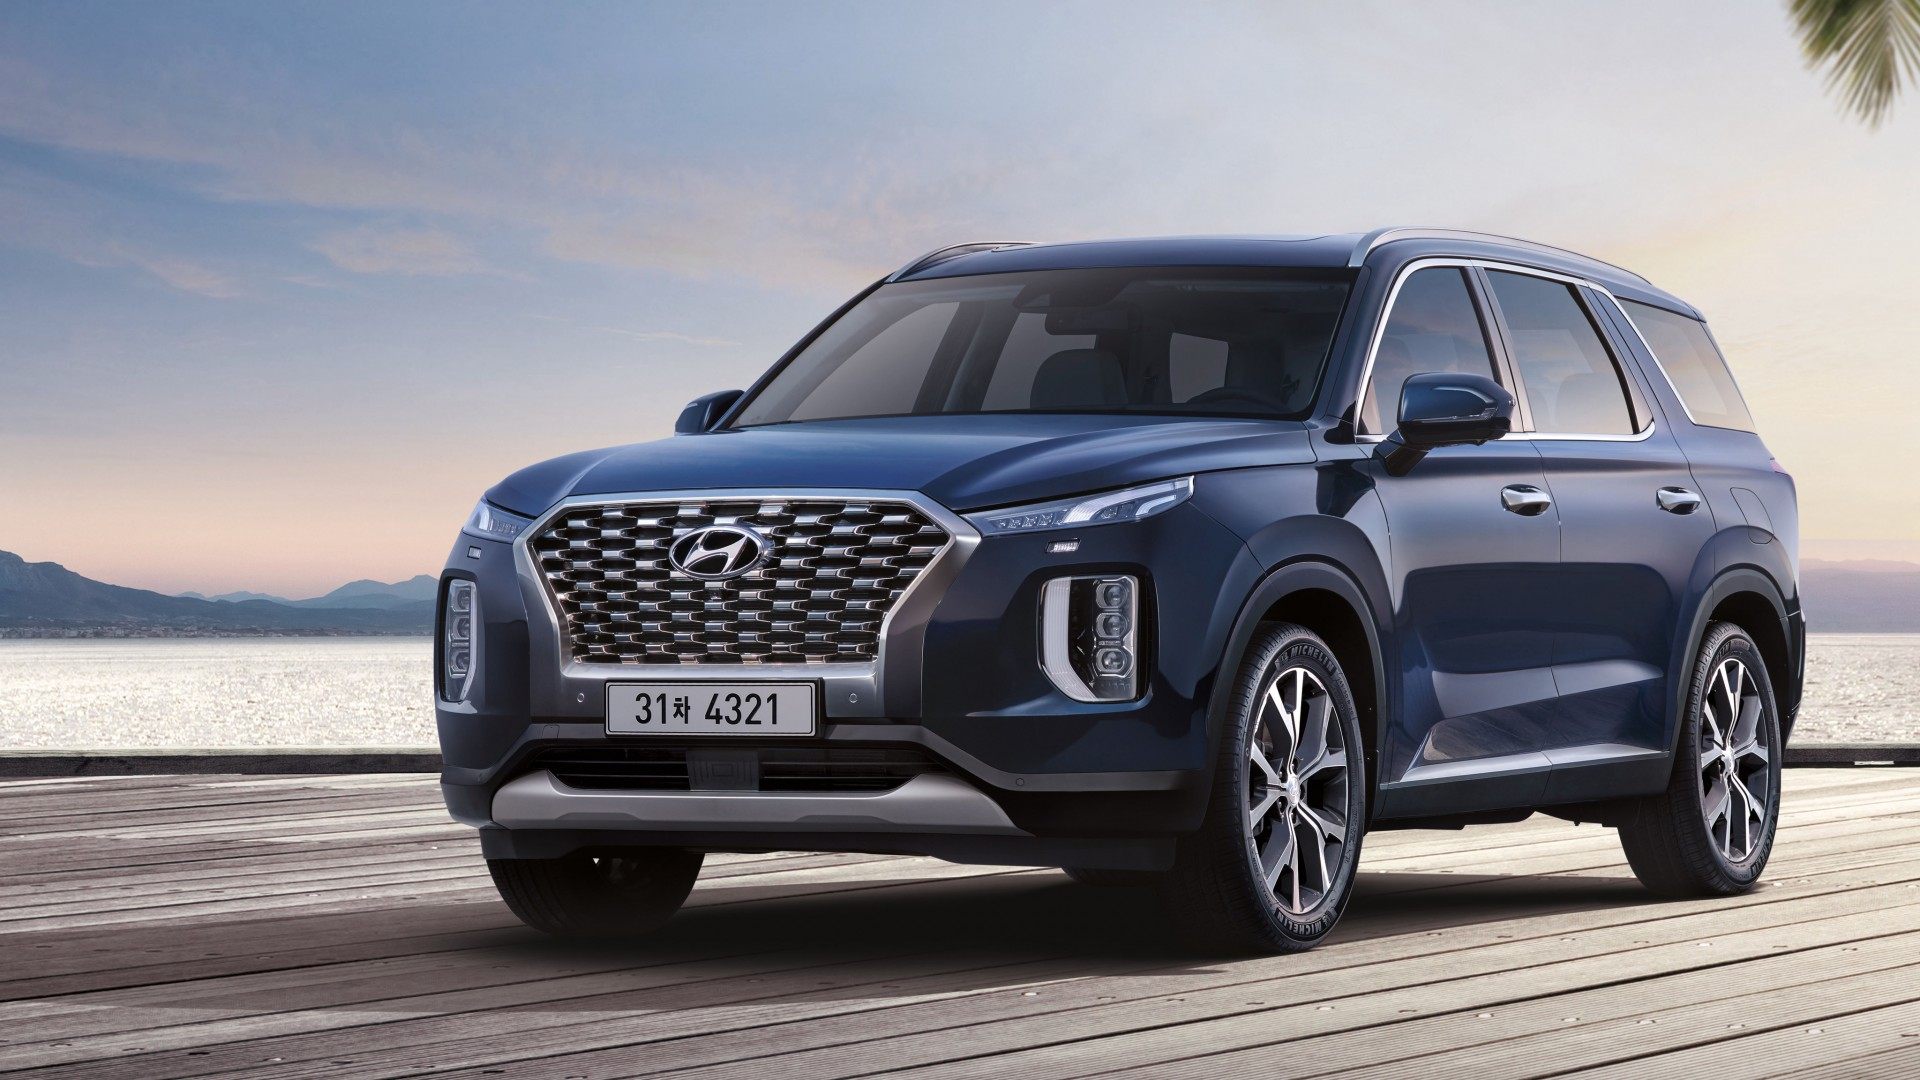 Hyundai Palisade 2020 4K Wallpaper | HD Car Wallpapers ...